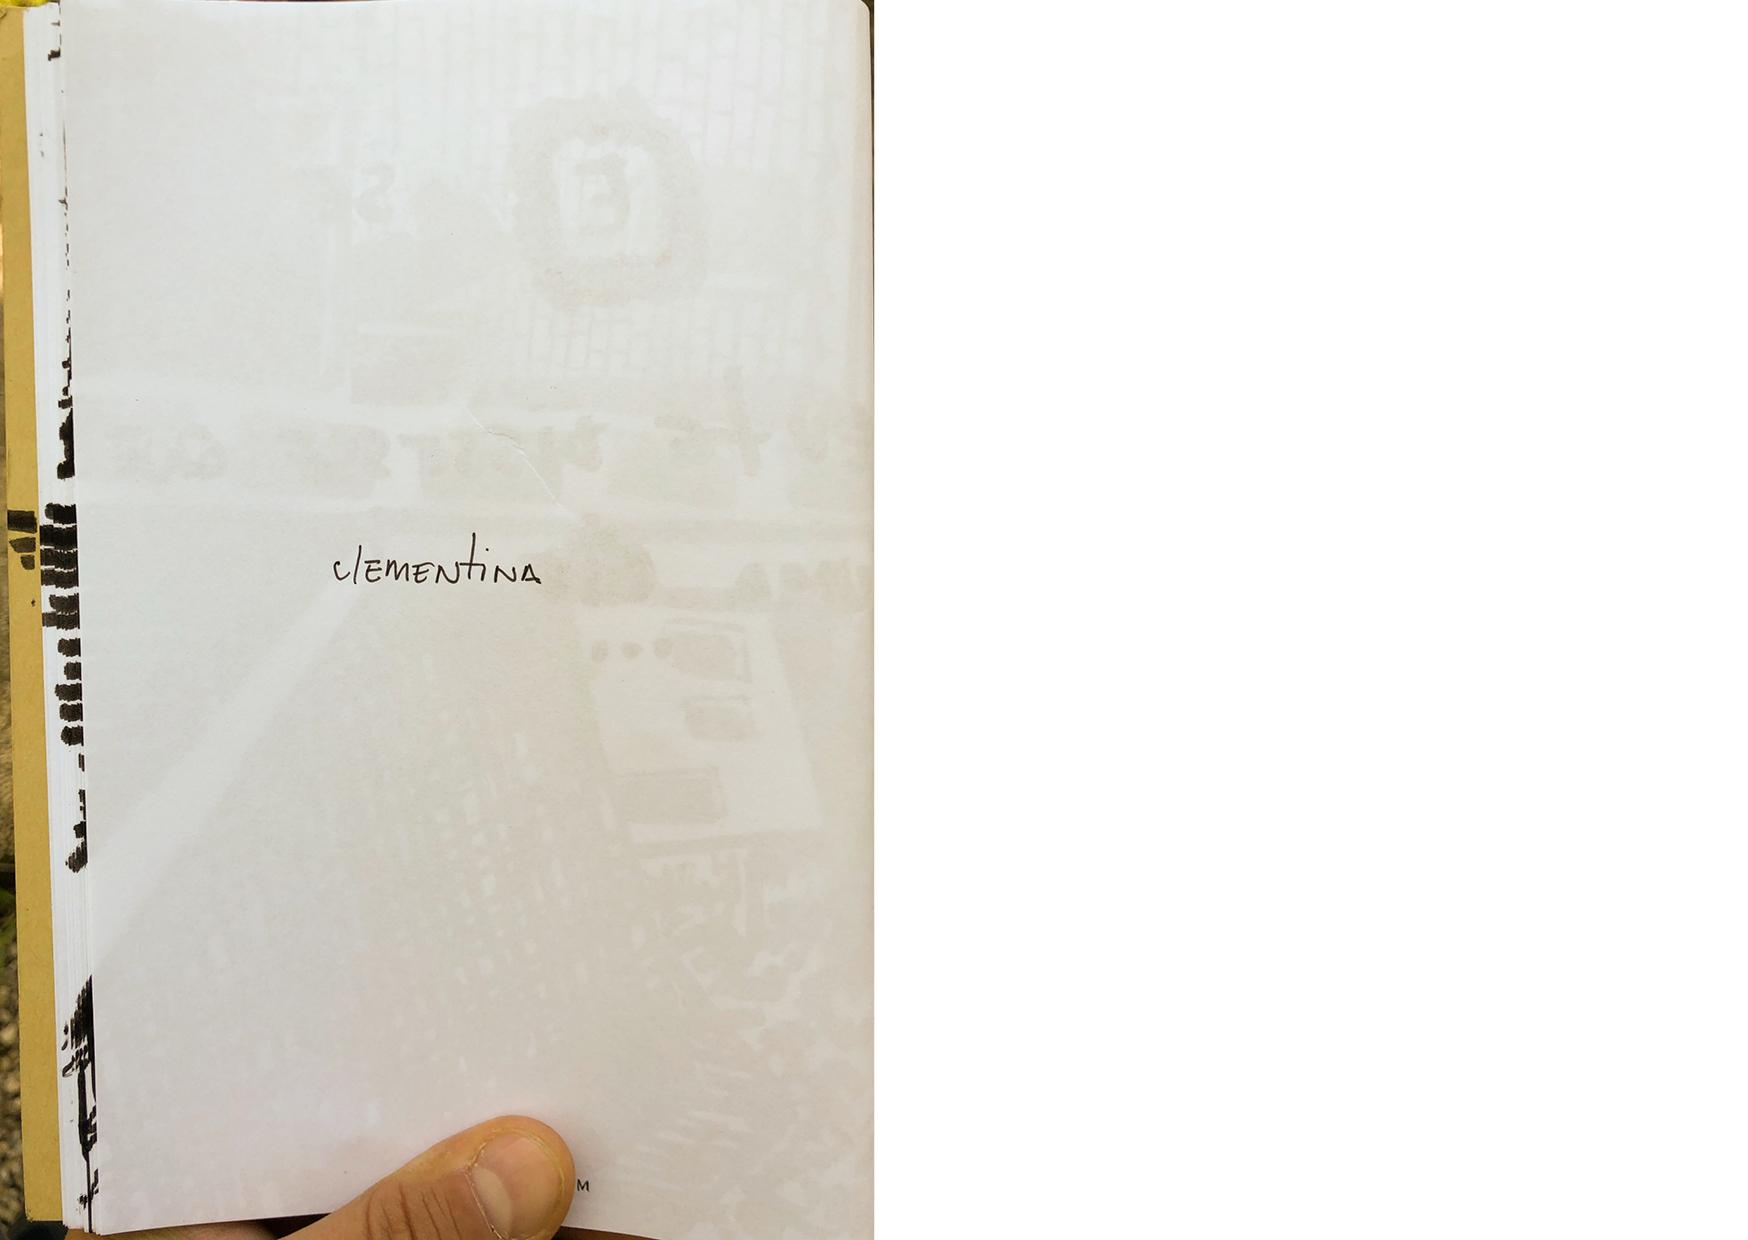 clementina2.jpg